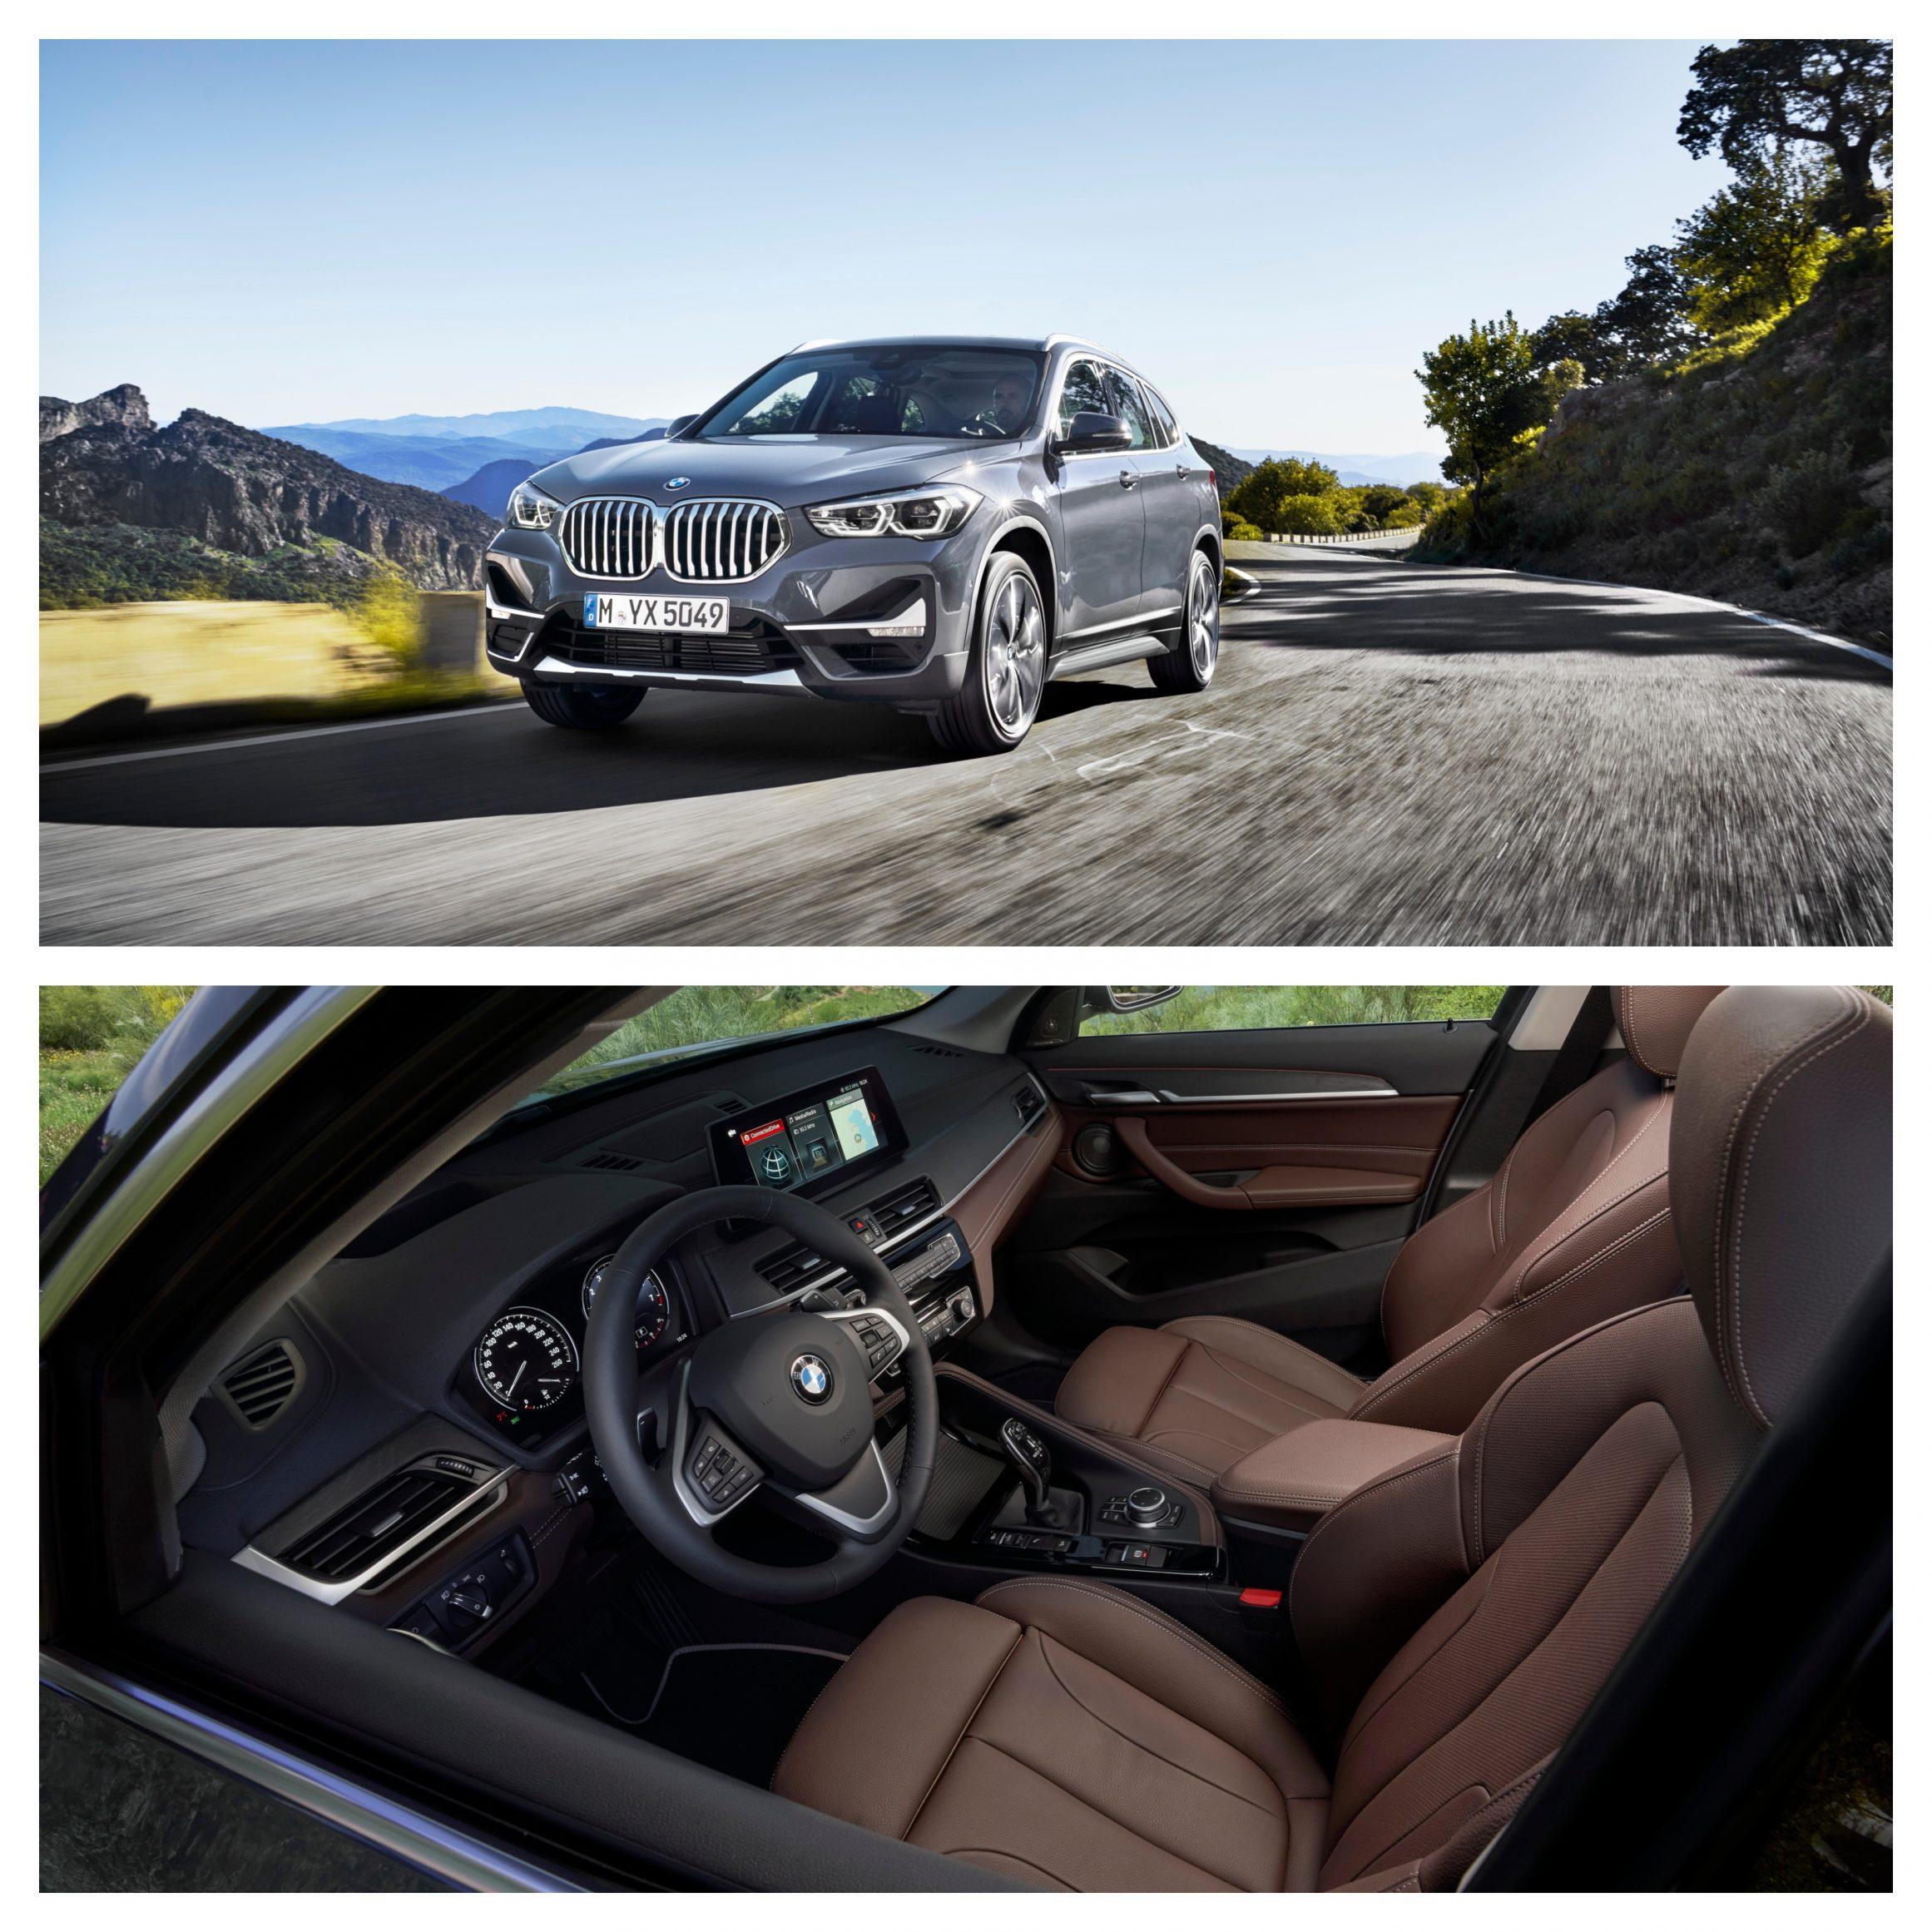 Best medium automatic cars - BMW X1